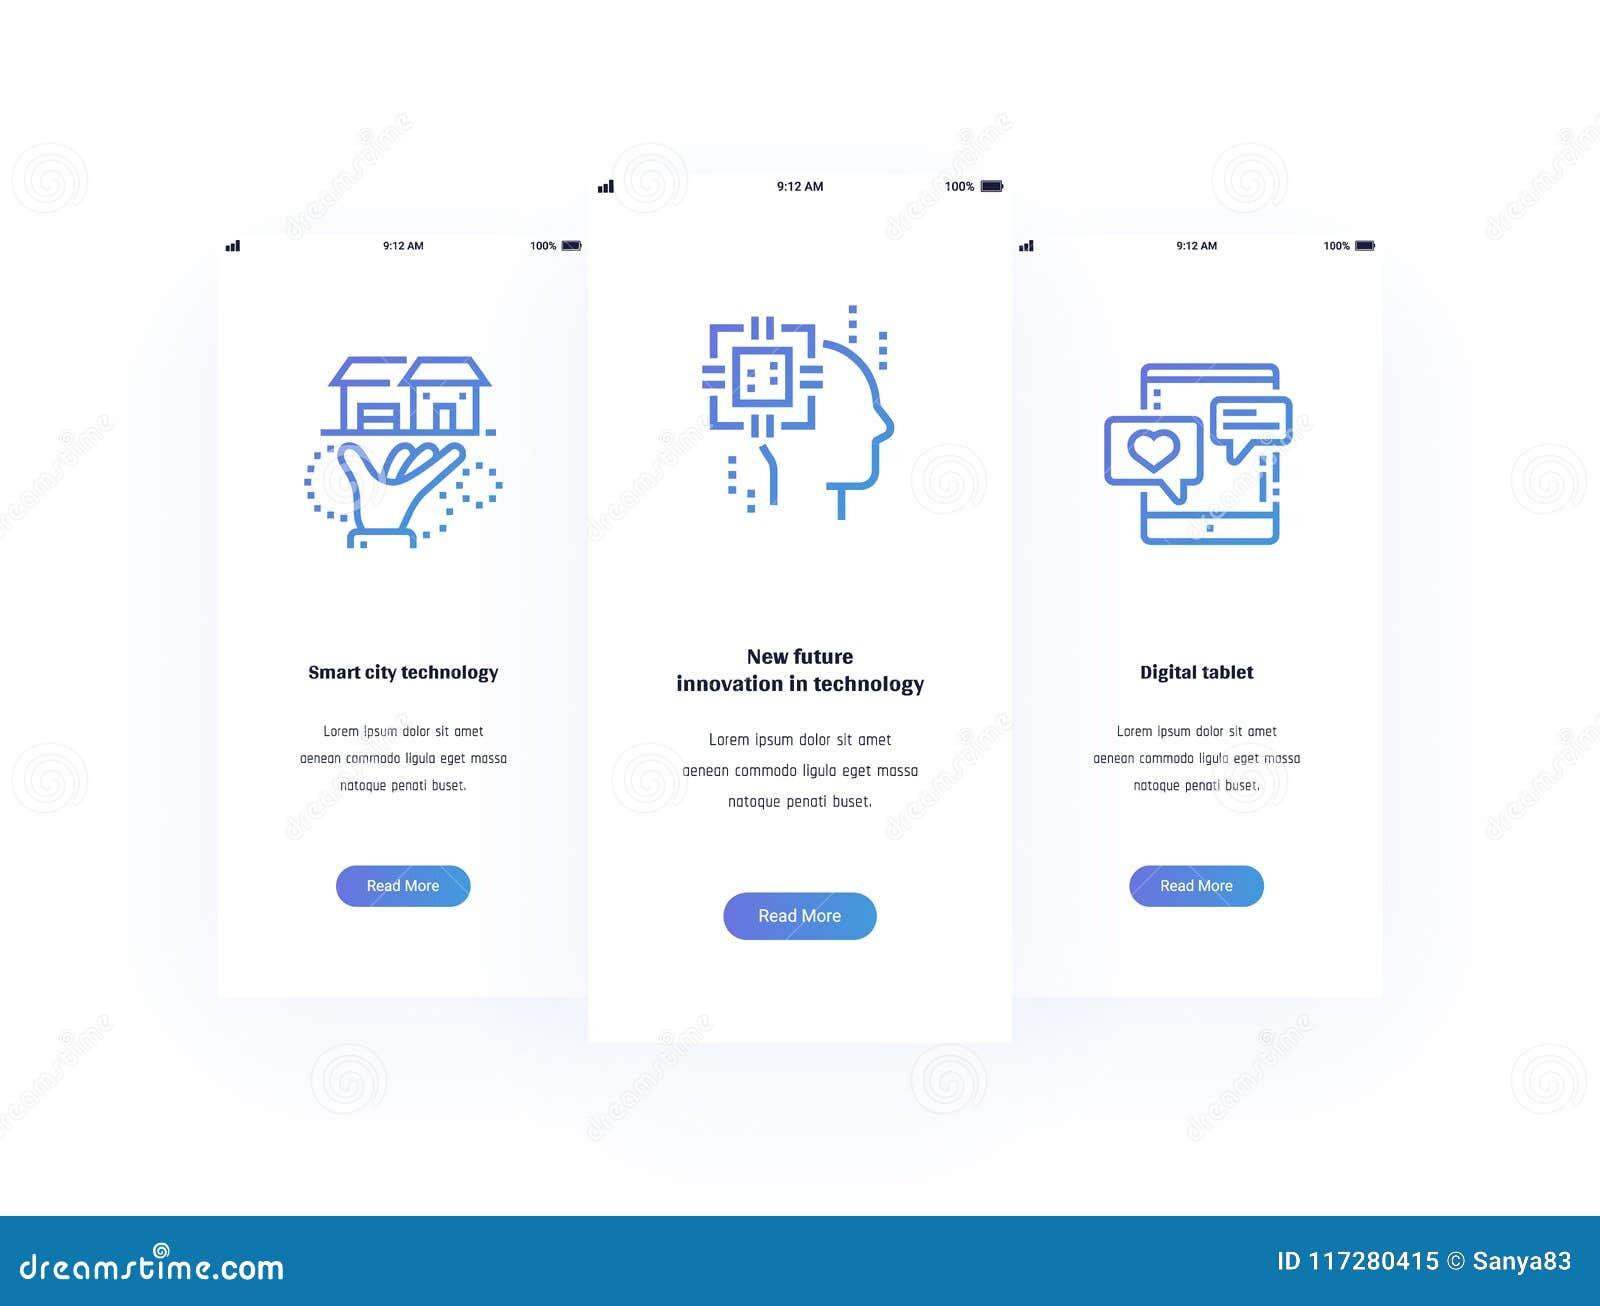 Slimme stadstechnologie, Nieuwe toekomstige innovatie in technologie, Digitale tablet Verticale Kaarten met sterke metaforen